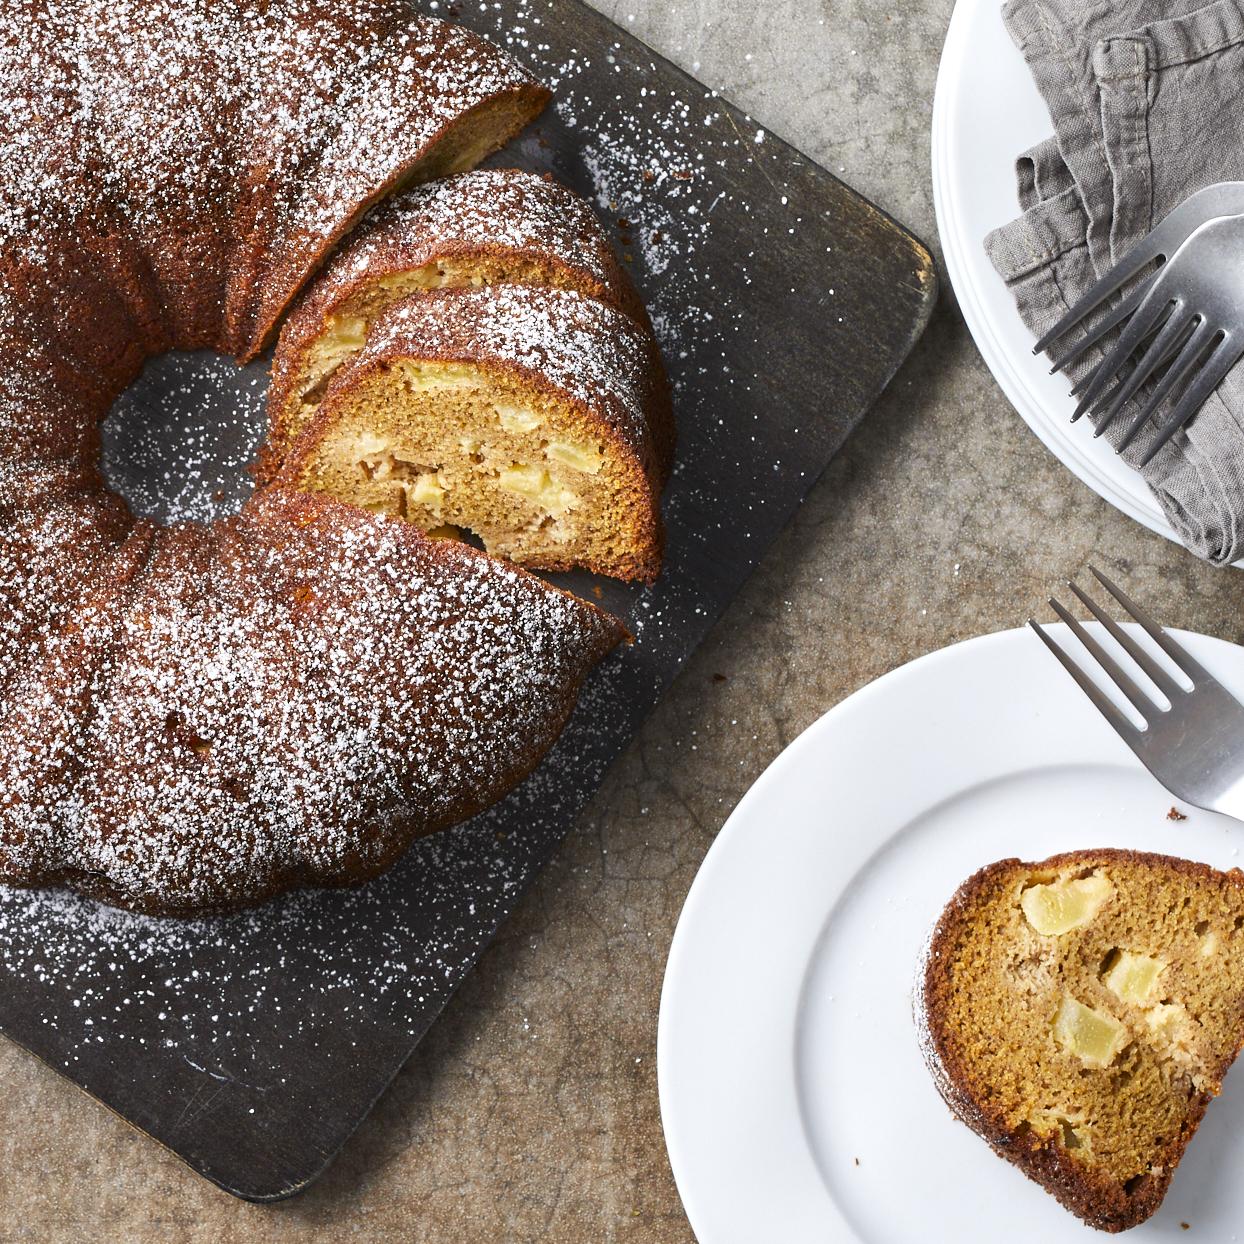 Apple-Cinnamon Cake Trusted Brands